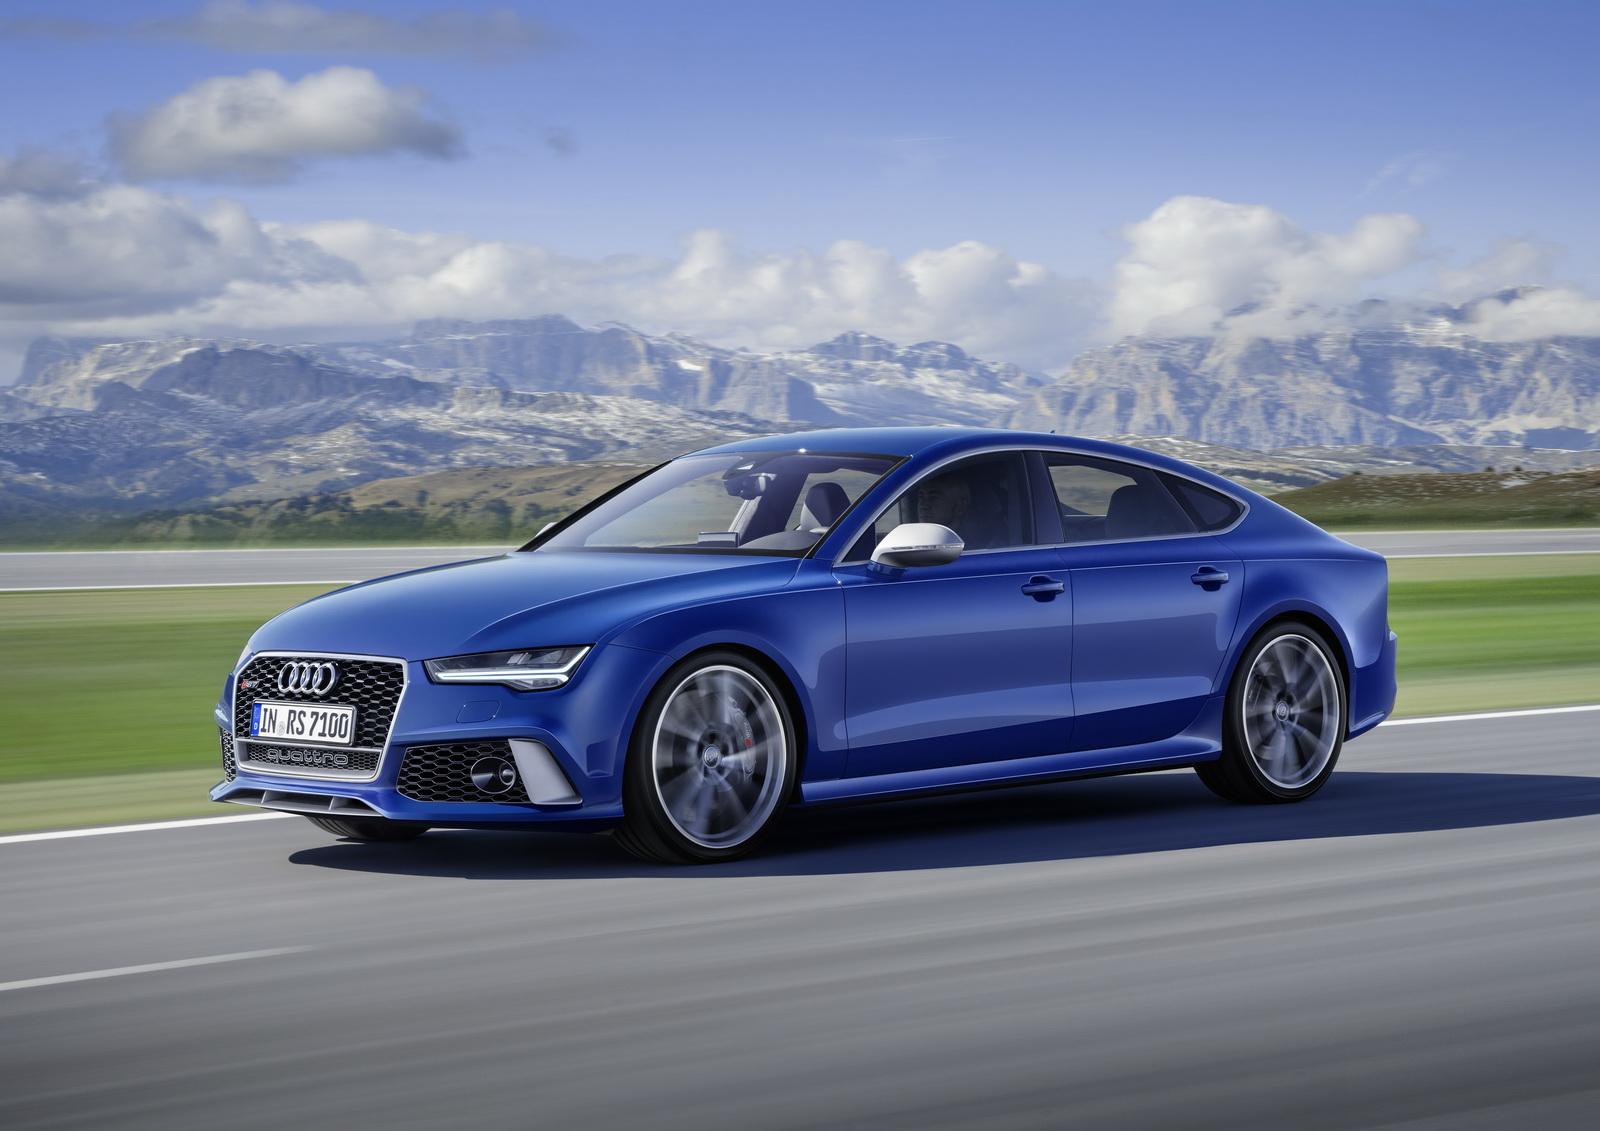 Audi Rs6 Avant E Rs7 Performance 2016 Autopareri 2017 Sportback With A Red Colour 2015 Audirs7perfomance 14